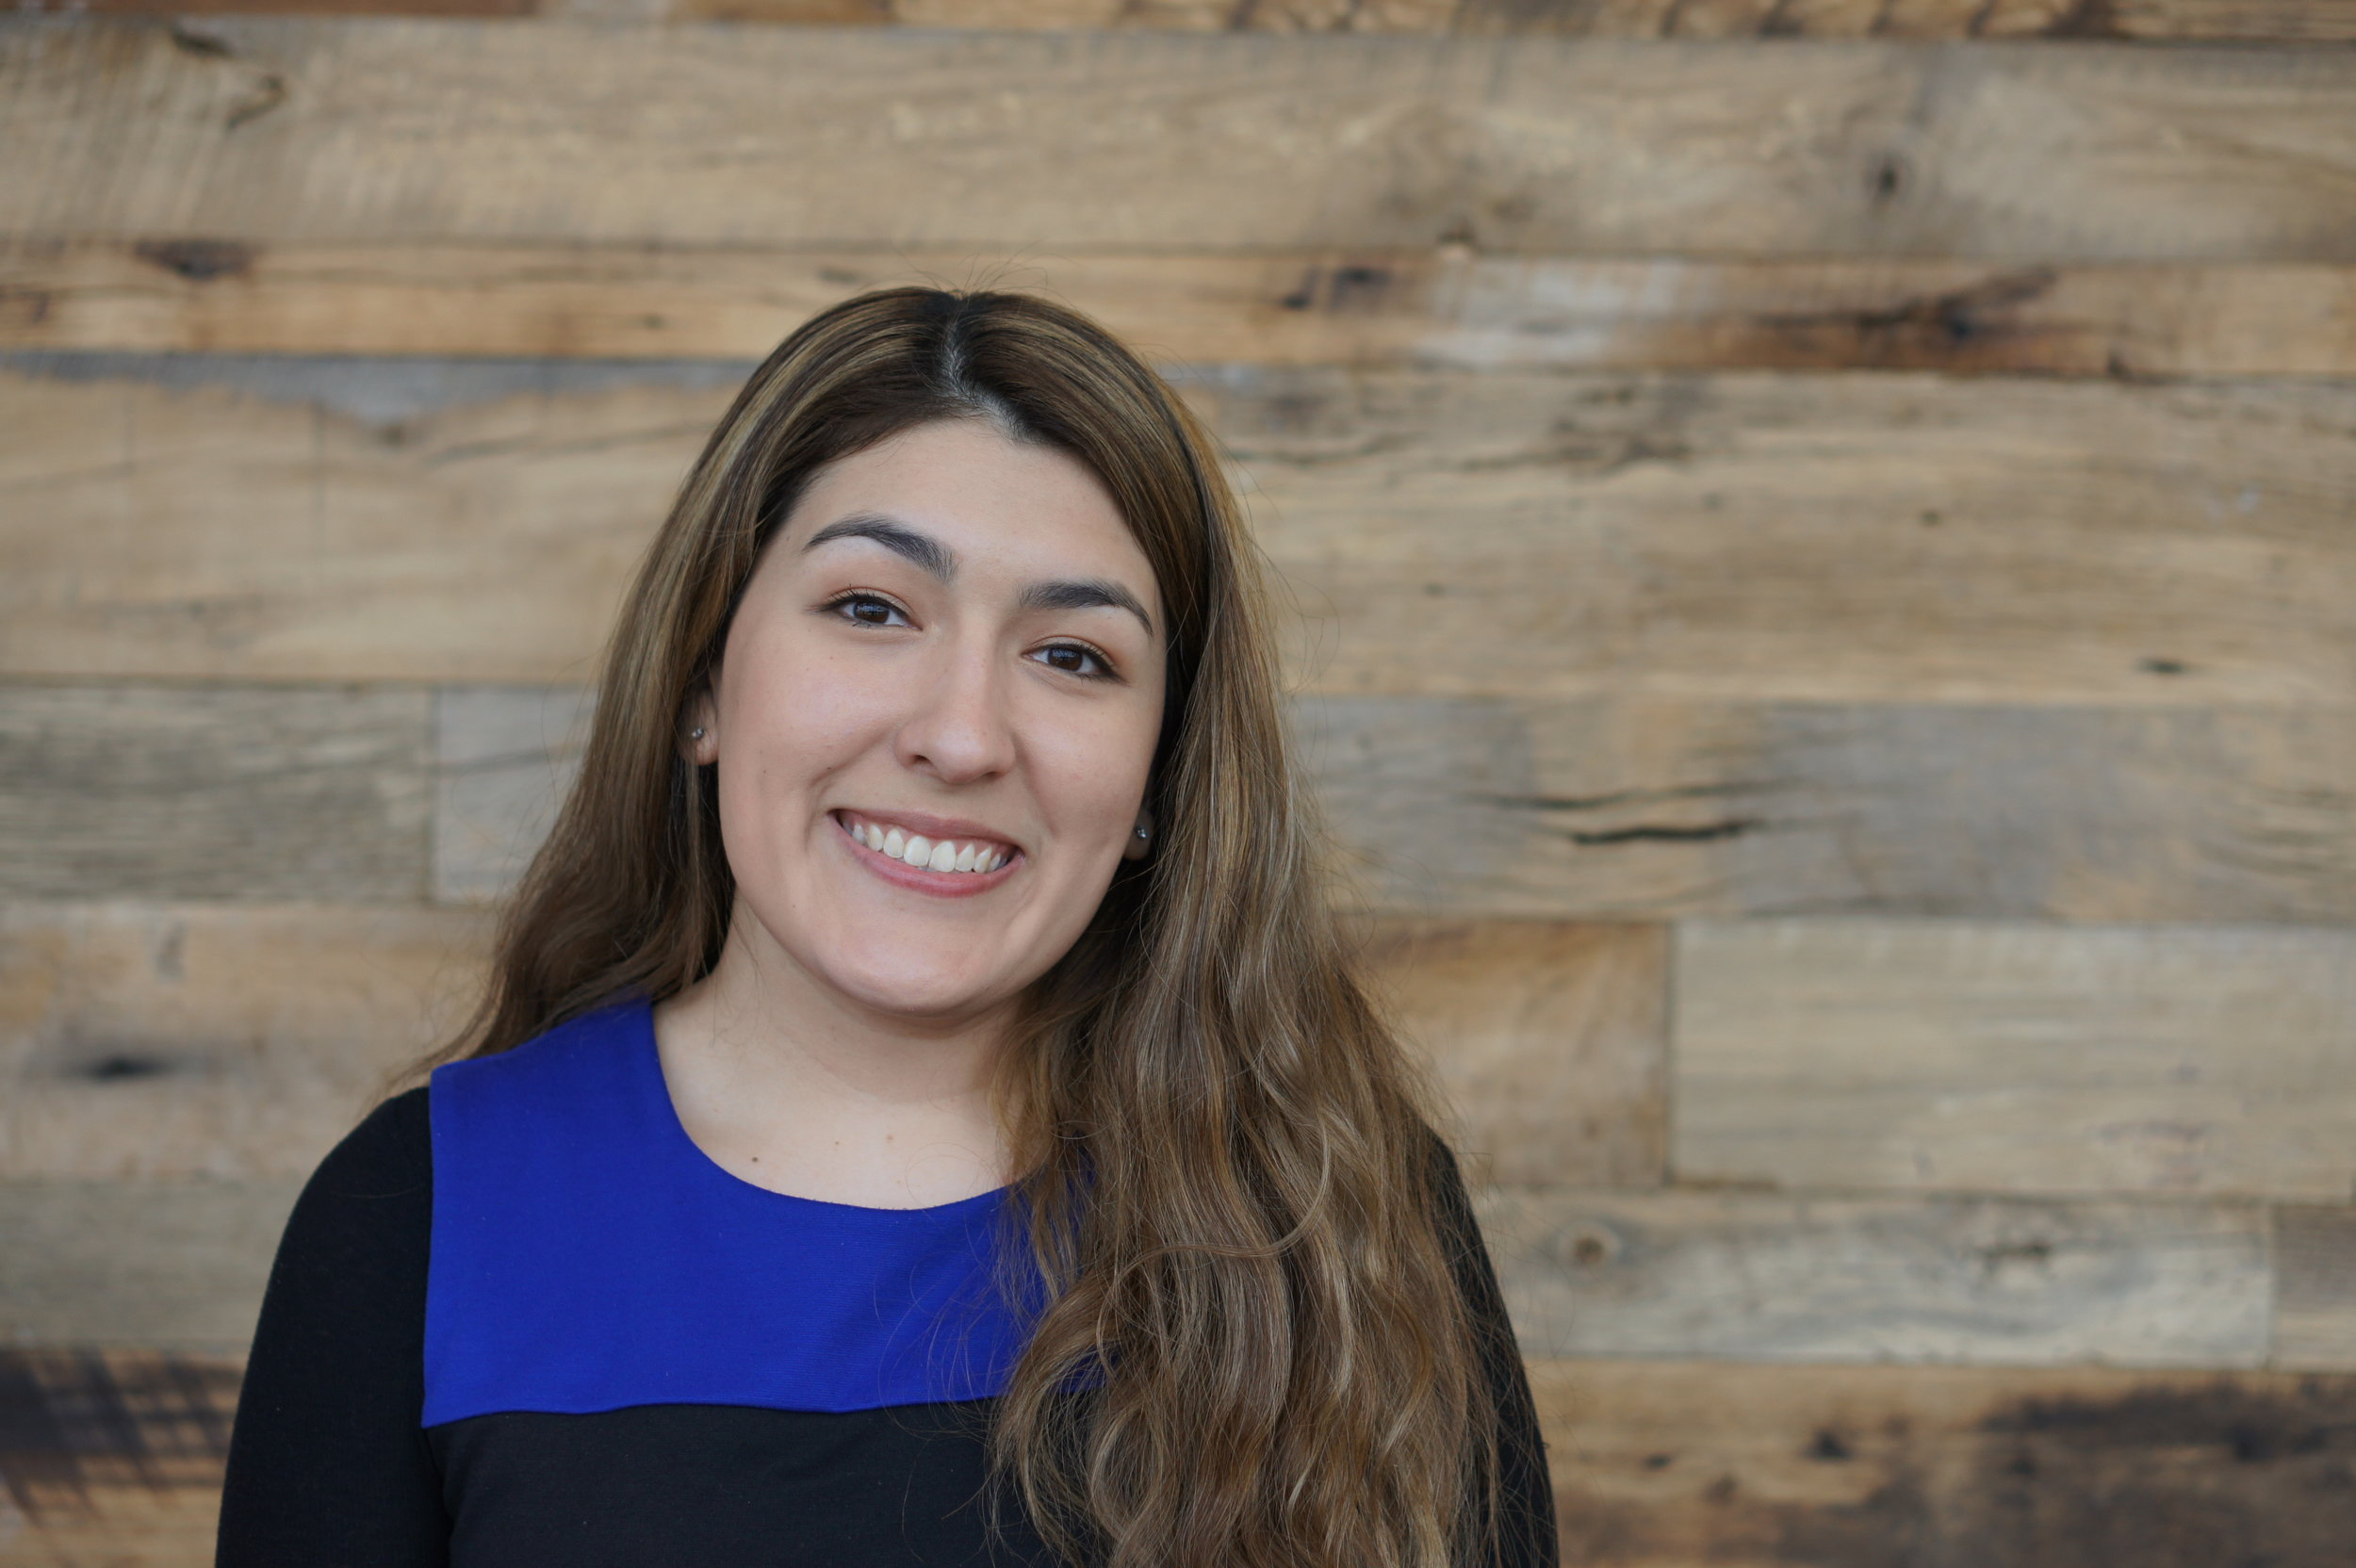 Marissa Del Aguila-Vienrich  Criminology, Senior  University of North Carolina at Greensboro  Cristina Roche Scholarship